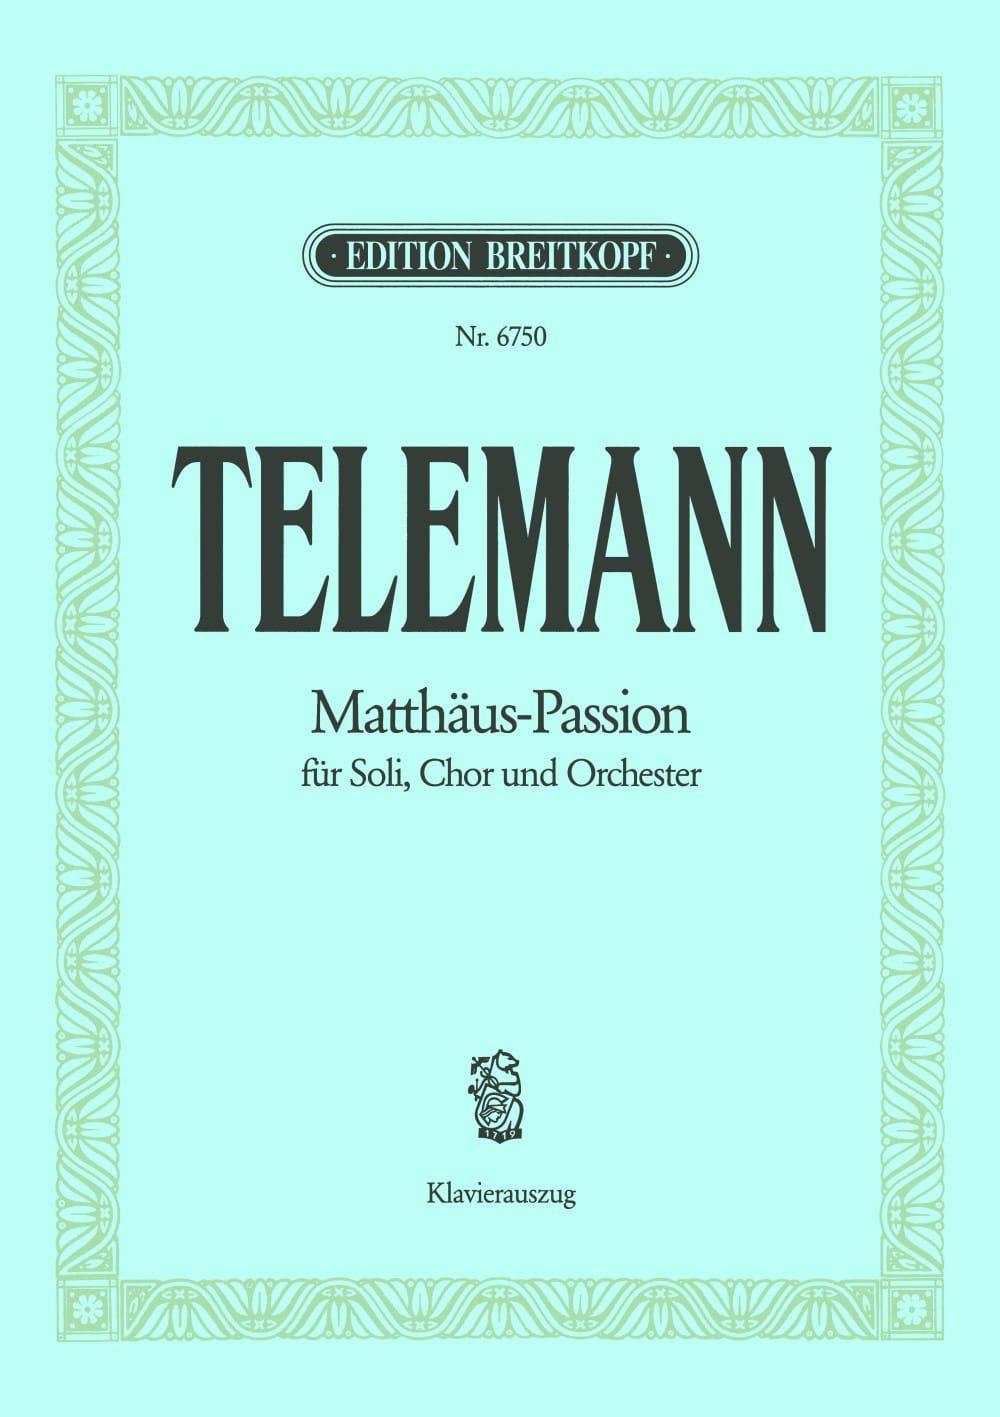 TELEMANN - Matthäus-Passion - Passion According to Saint-Mathieu - Partition - di-arezzo.co.uk